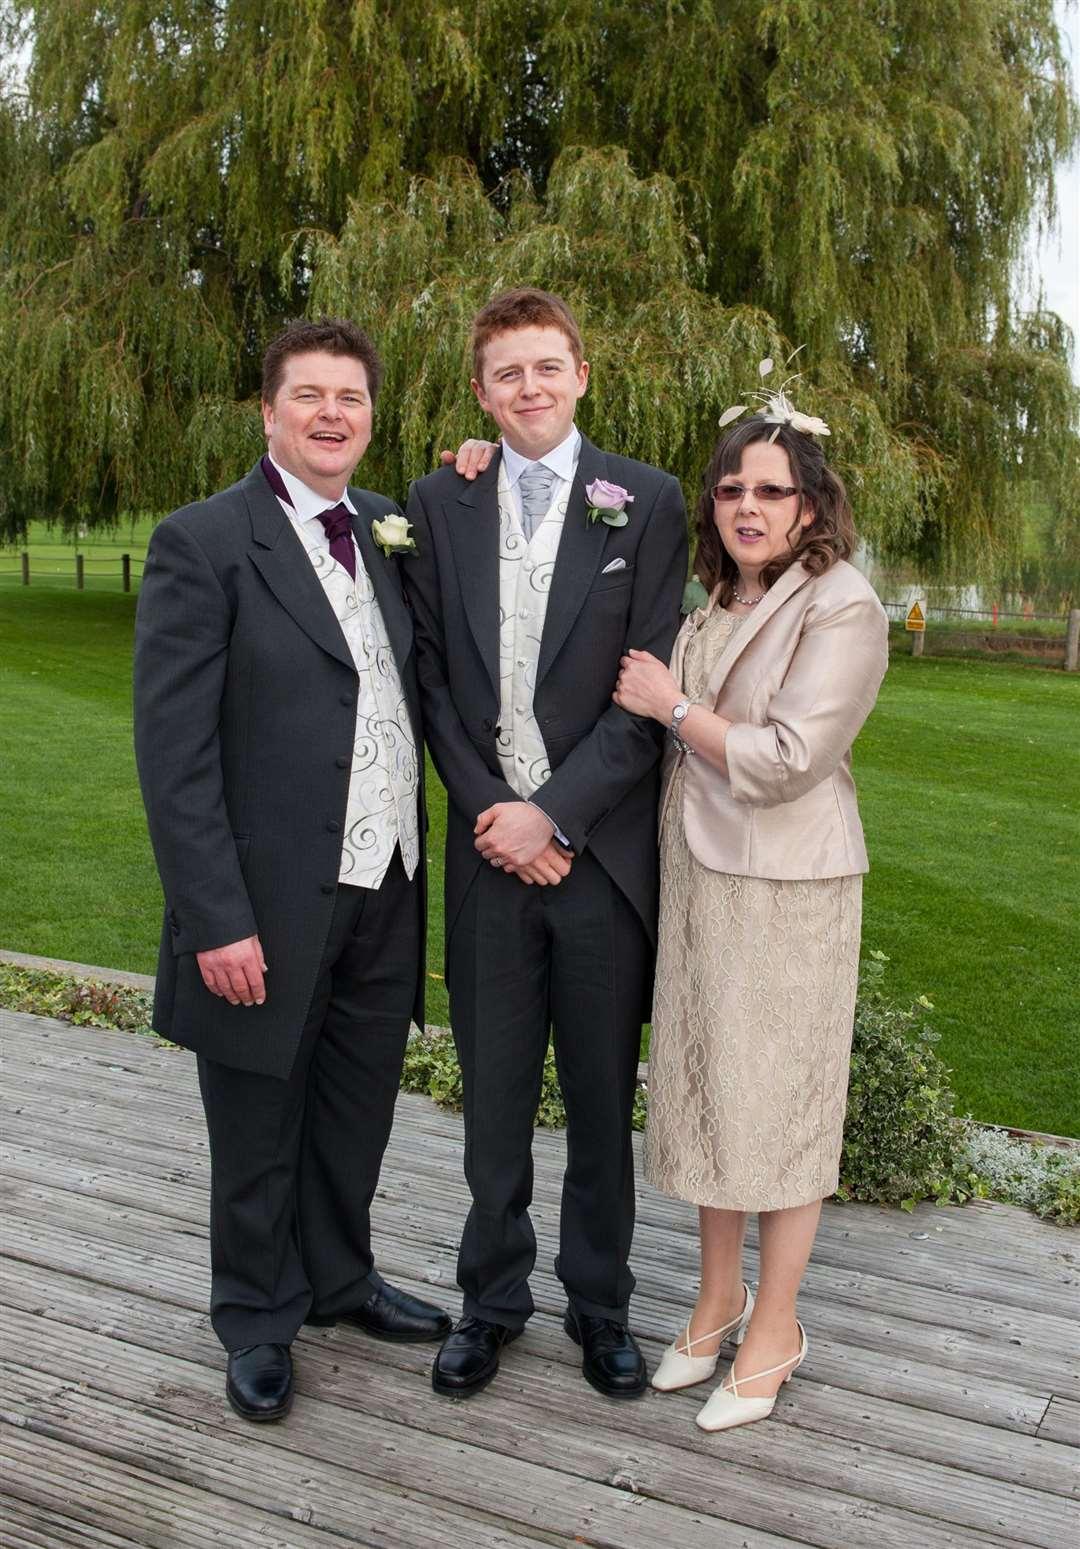 Steve and Amanda at son Ben's wedding